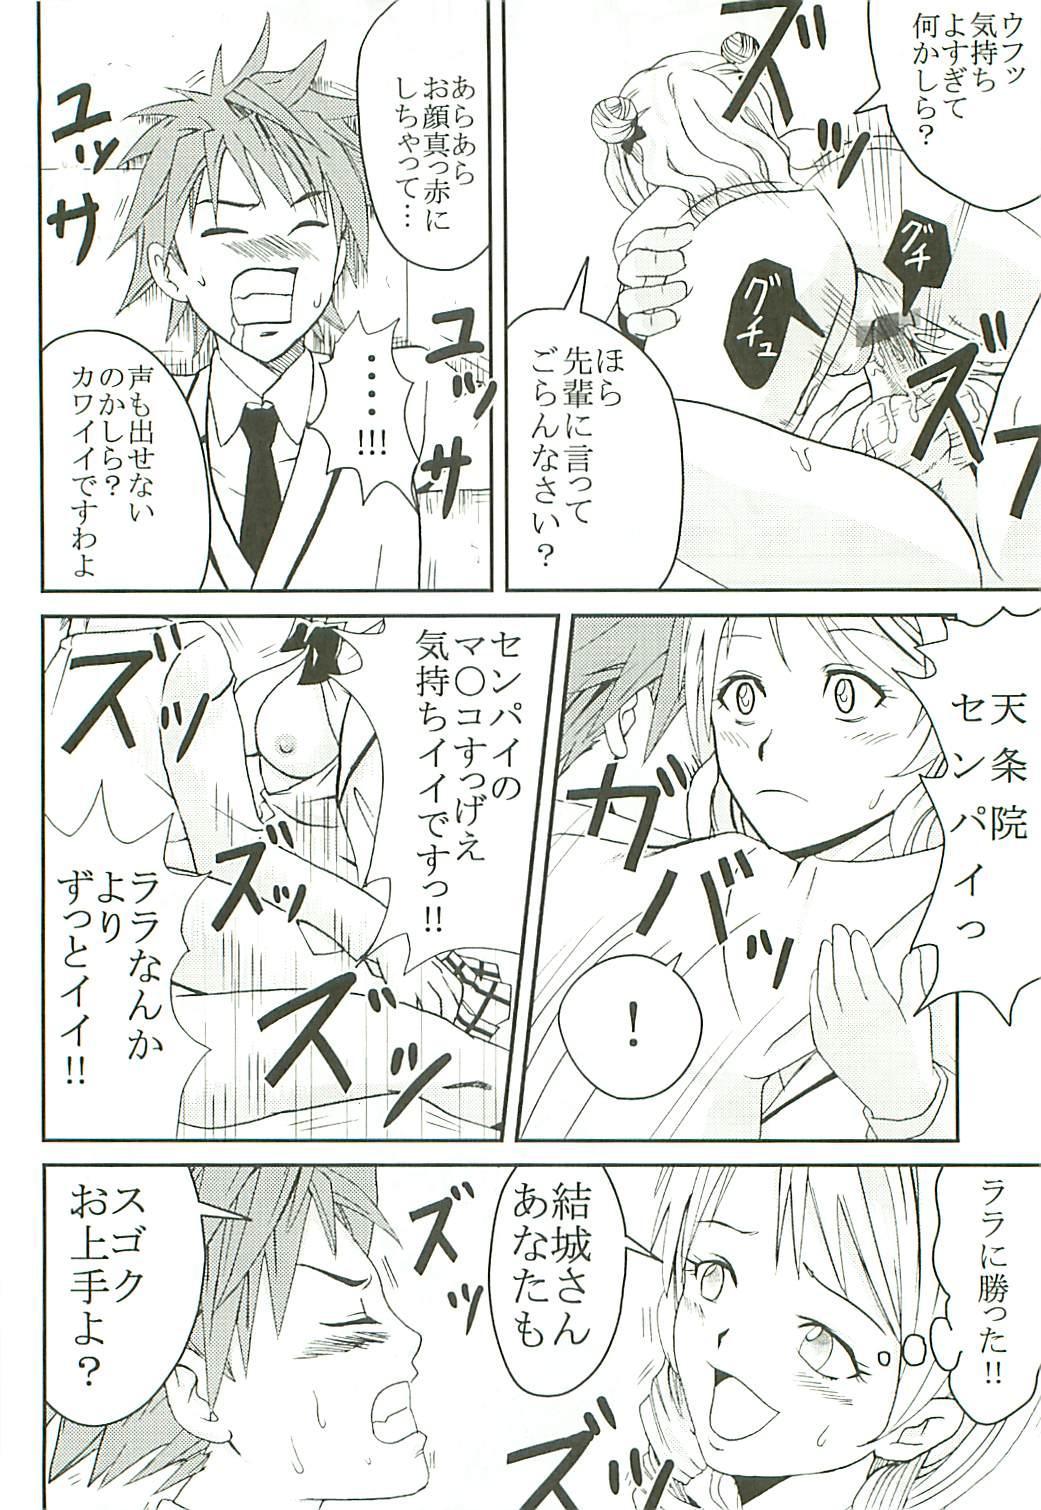 ToLOVE Ryu Vol. 7 40